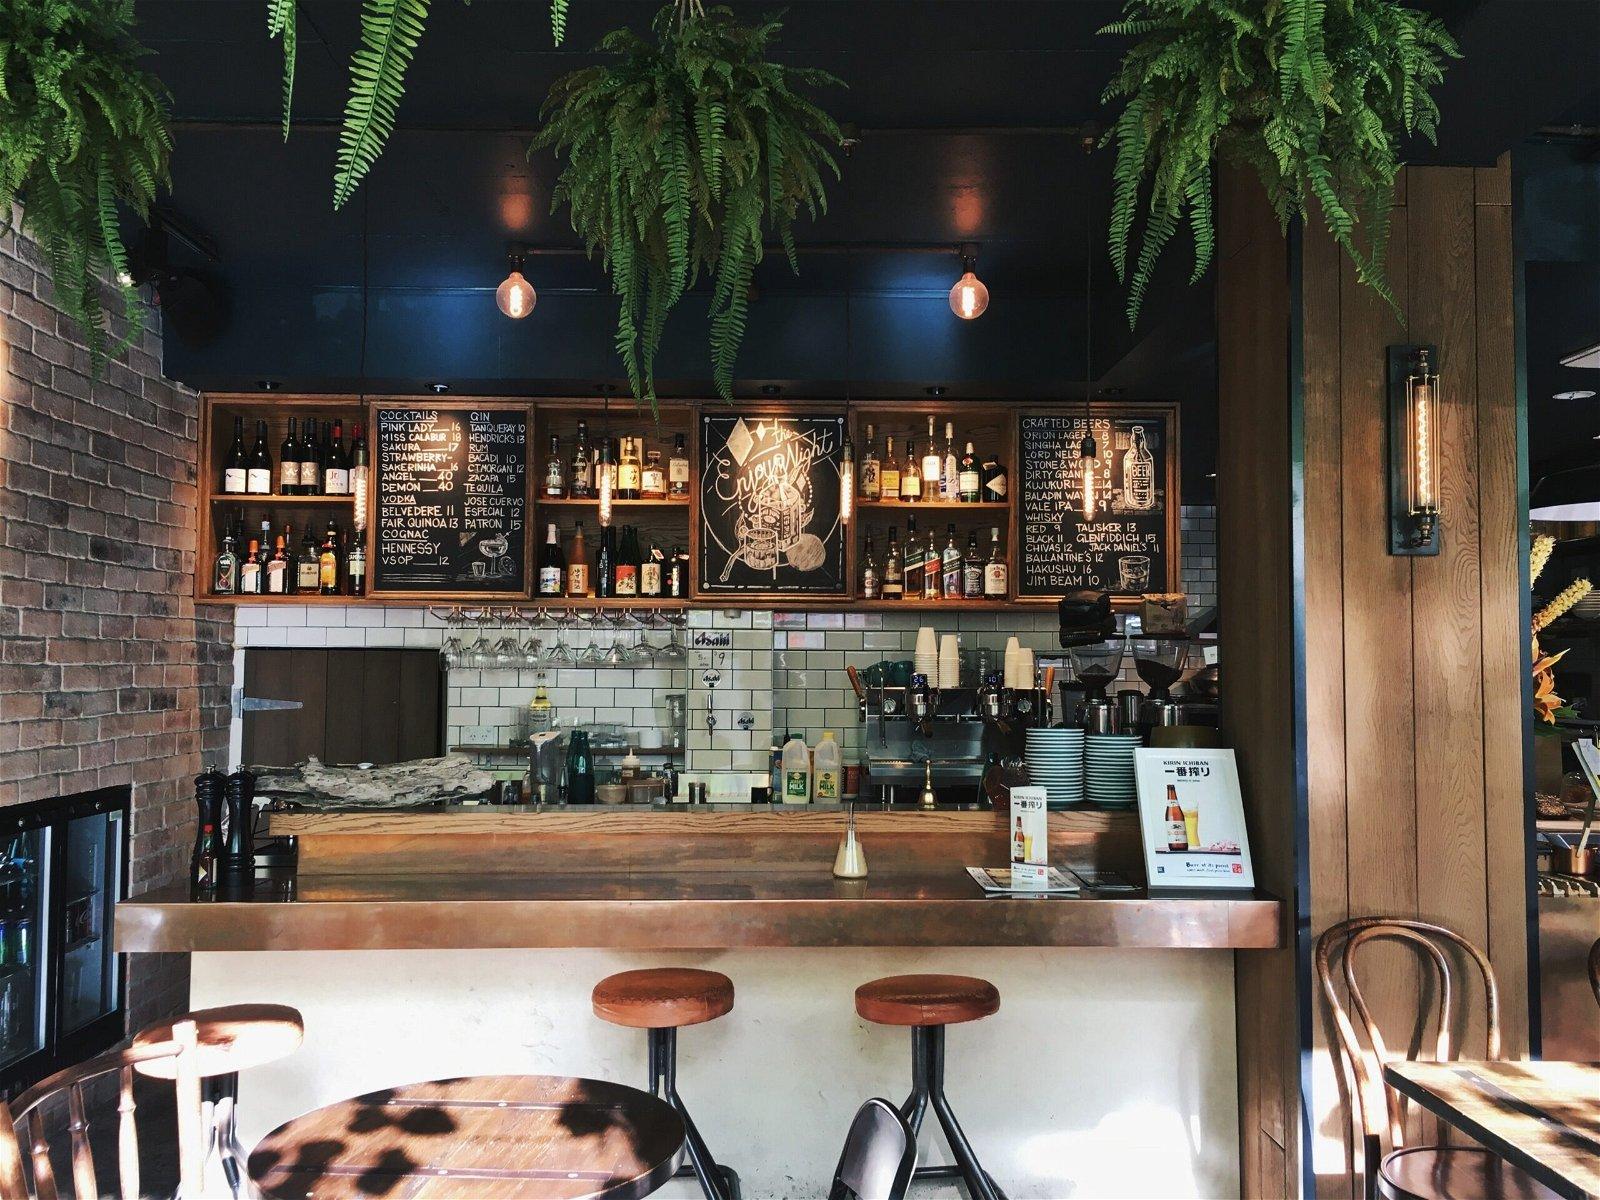 Cafe Design | Coffee Shop Design | Cafe Lighting | ImpeccaBuild (1)